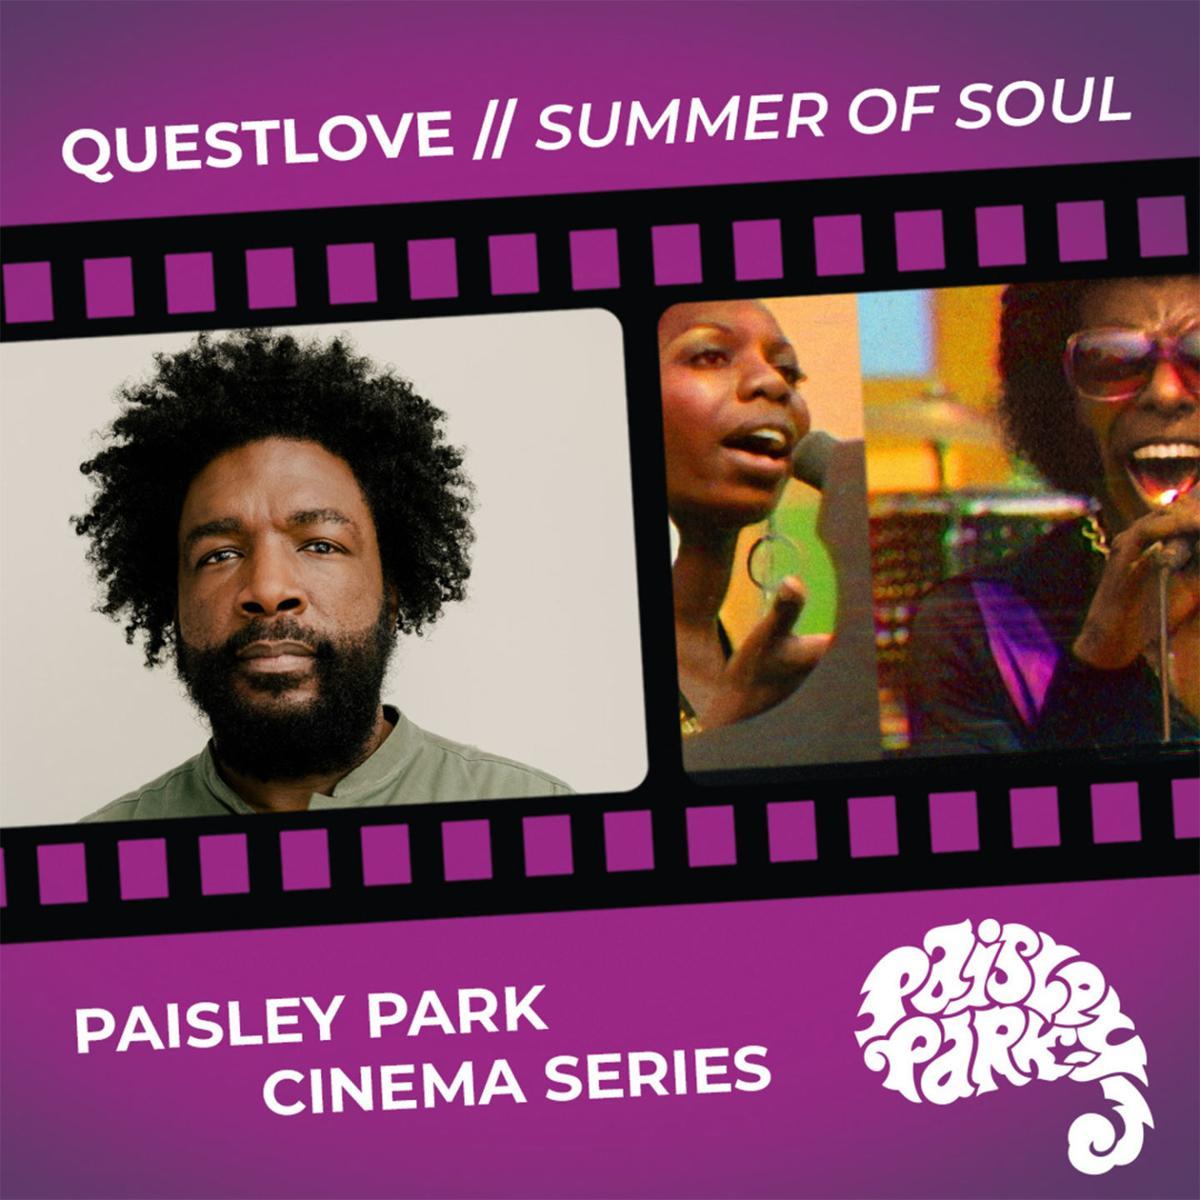 Paisley Park cinema series